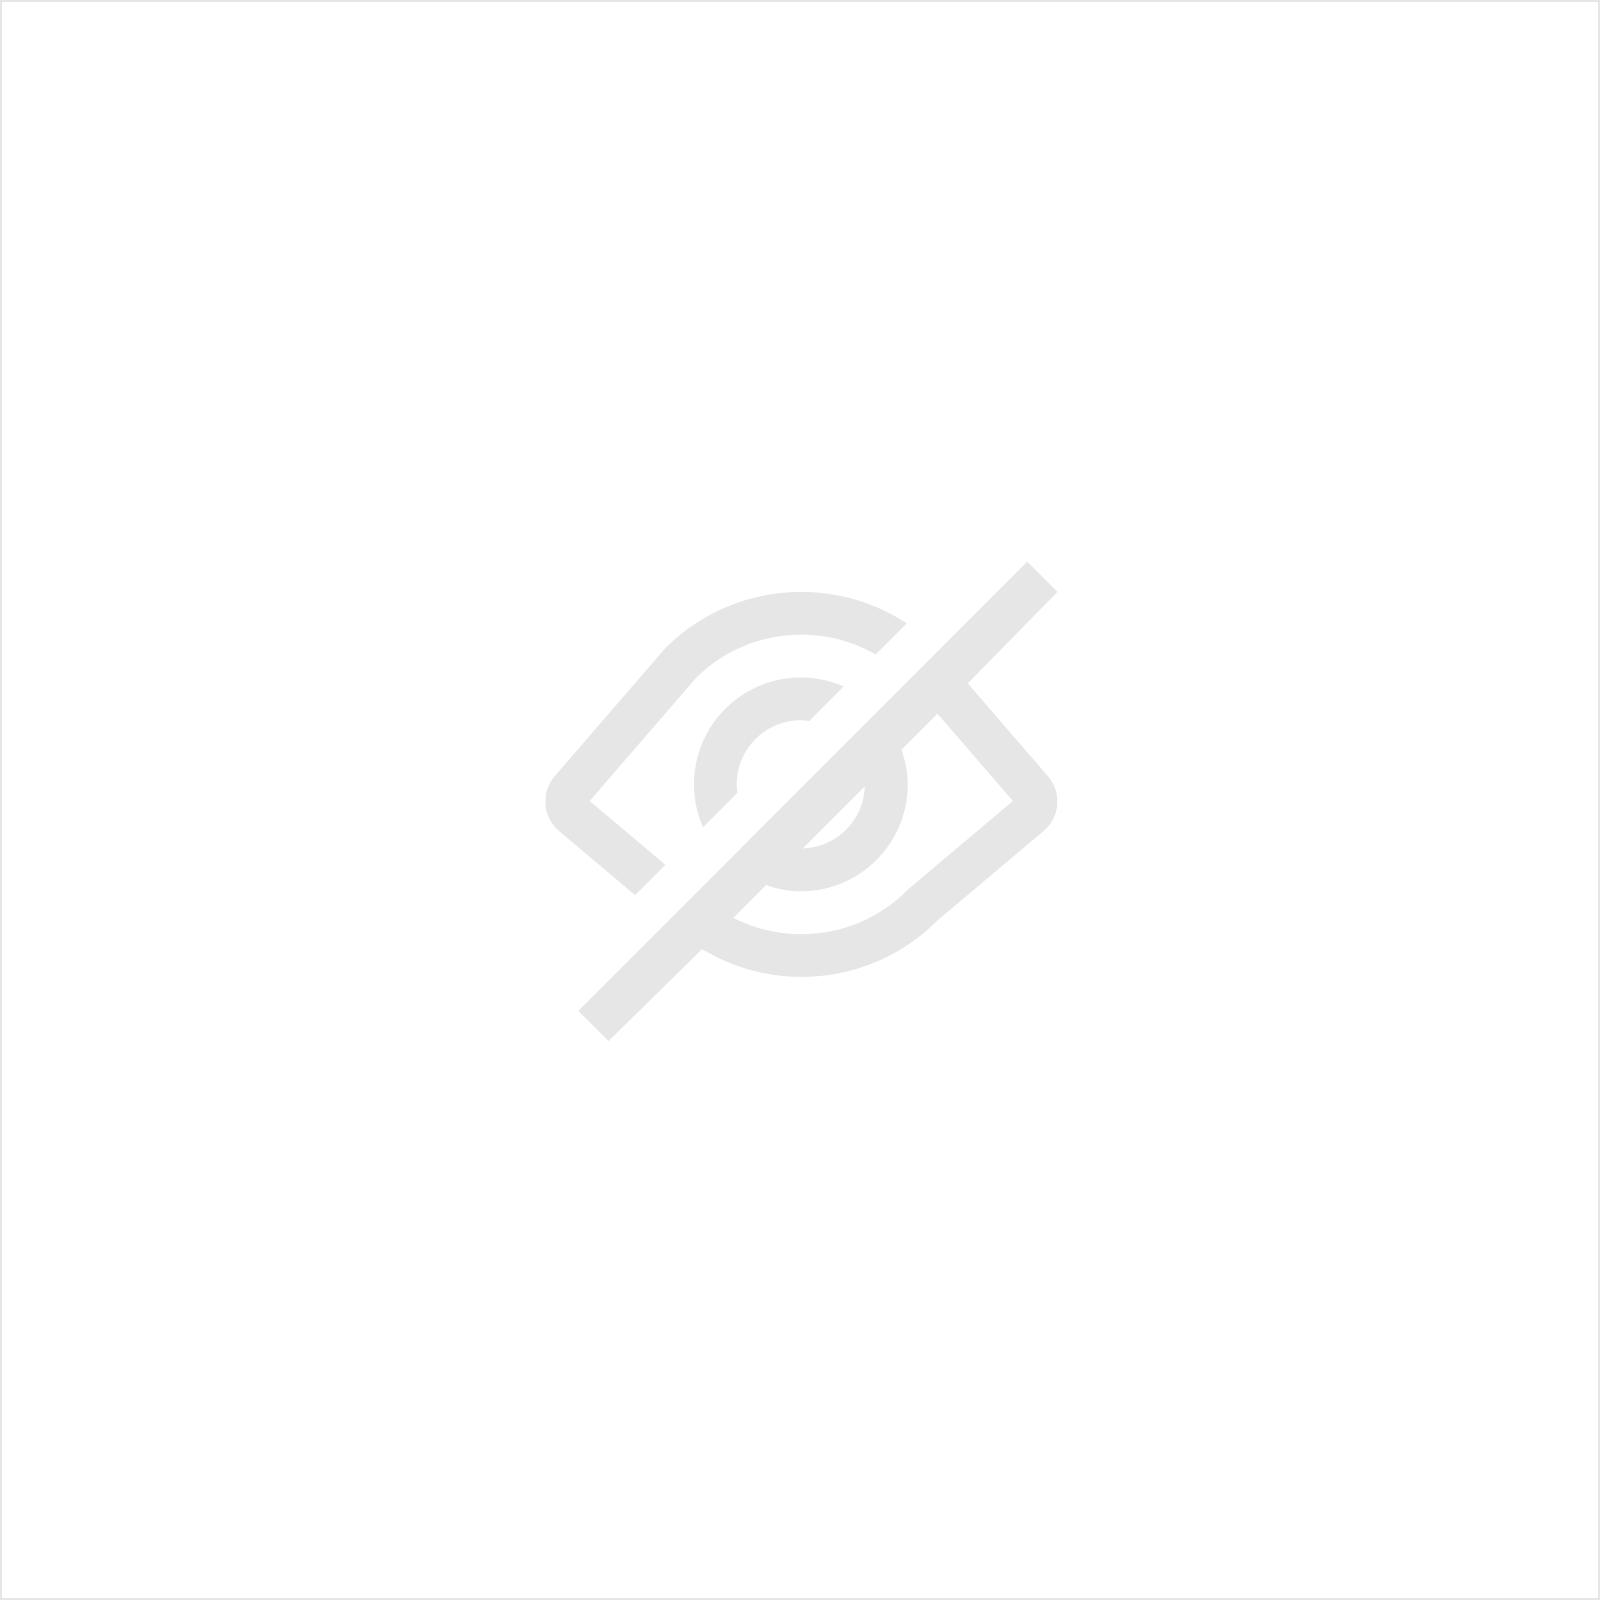 NOVOL BLANKE LAK (ACRYL) 2,5 L (65124)